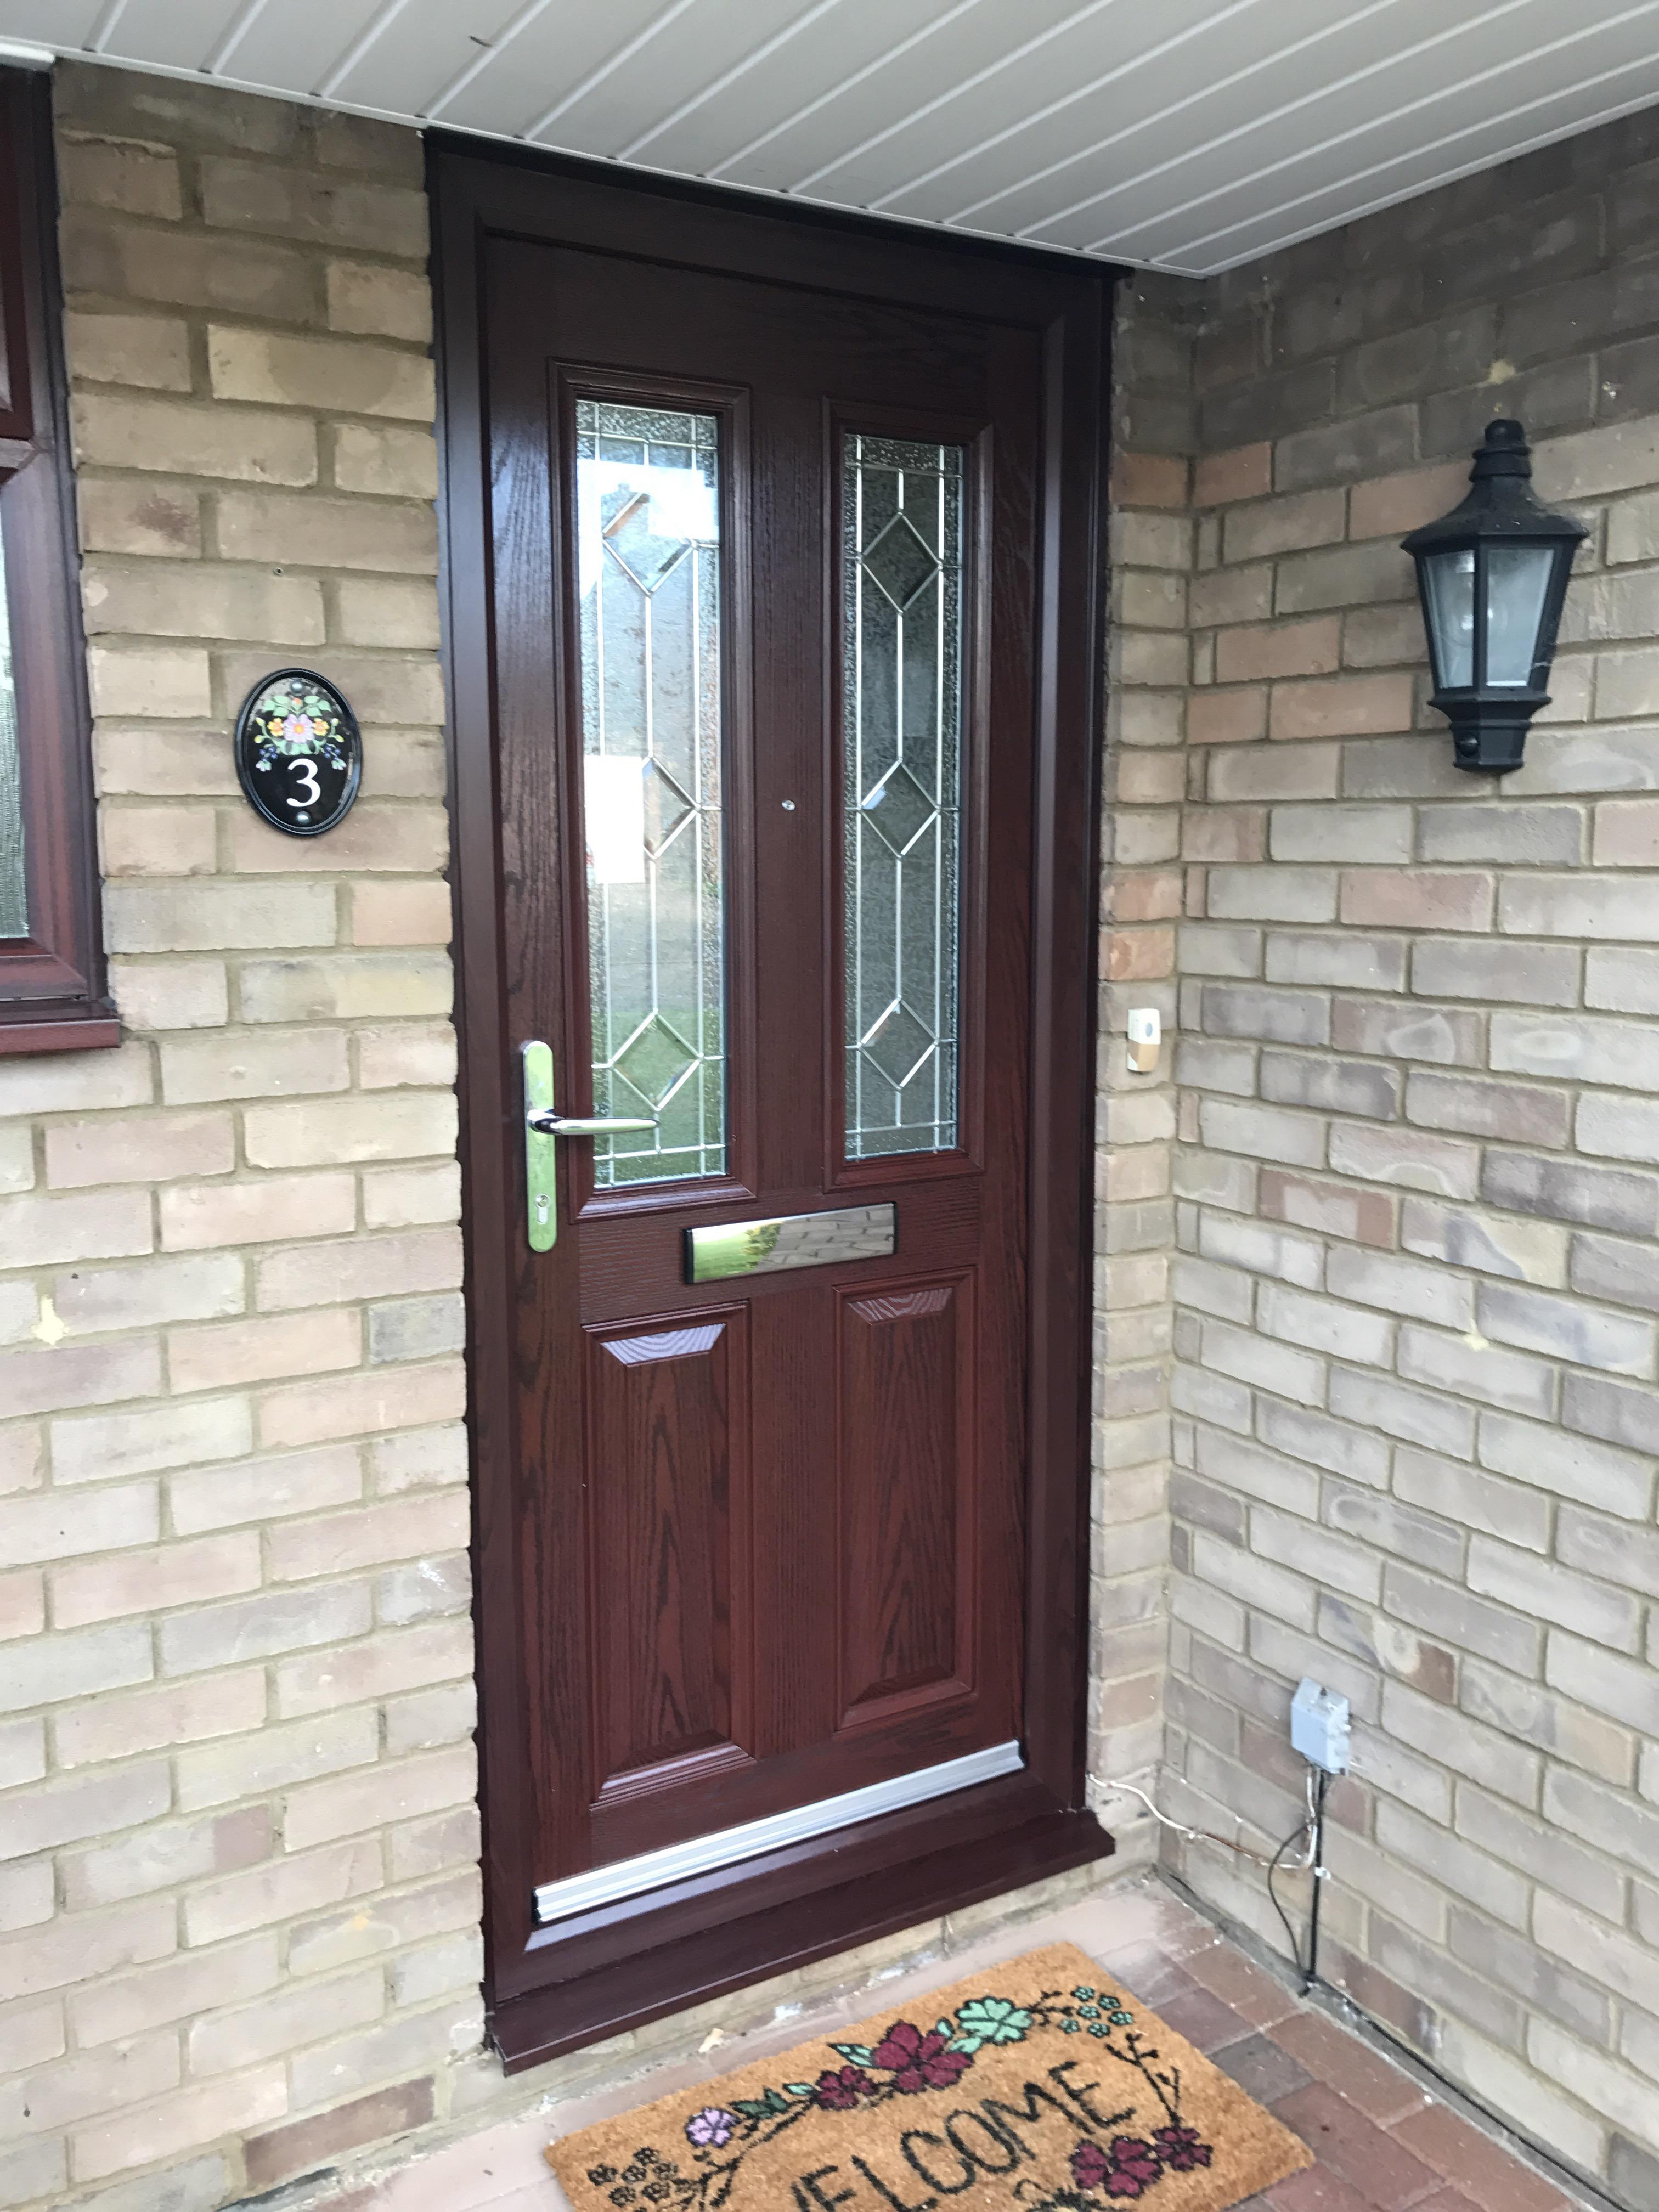 Rosewood Composite Door. Triple glazed & Composite Doors | Neil Amos Windows Pezcame.Com